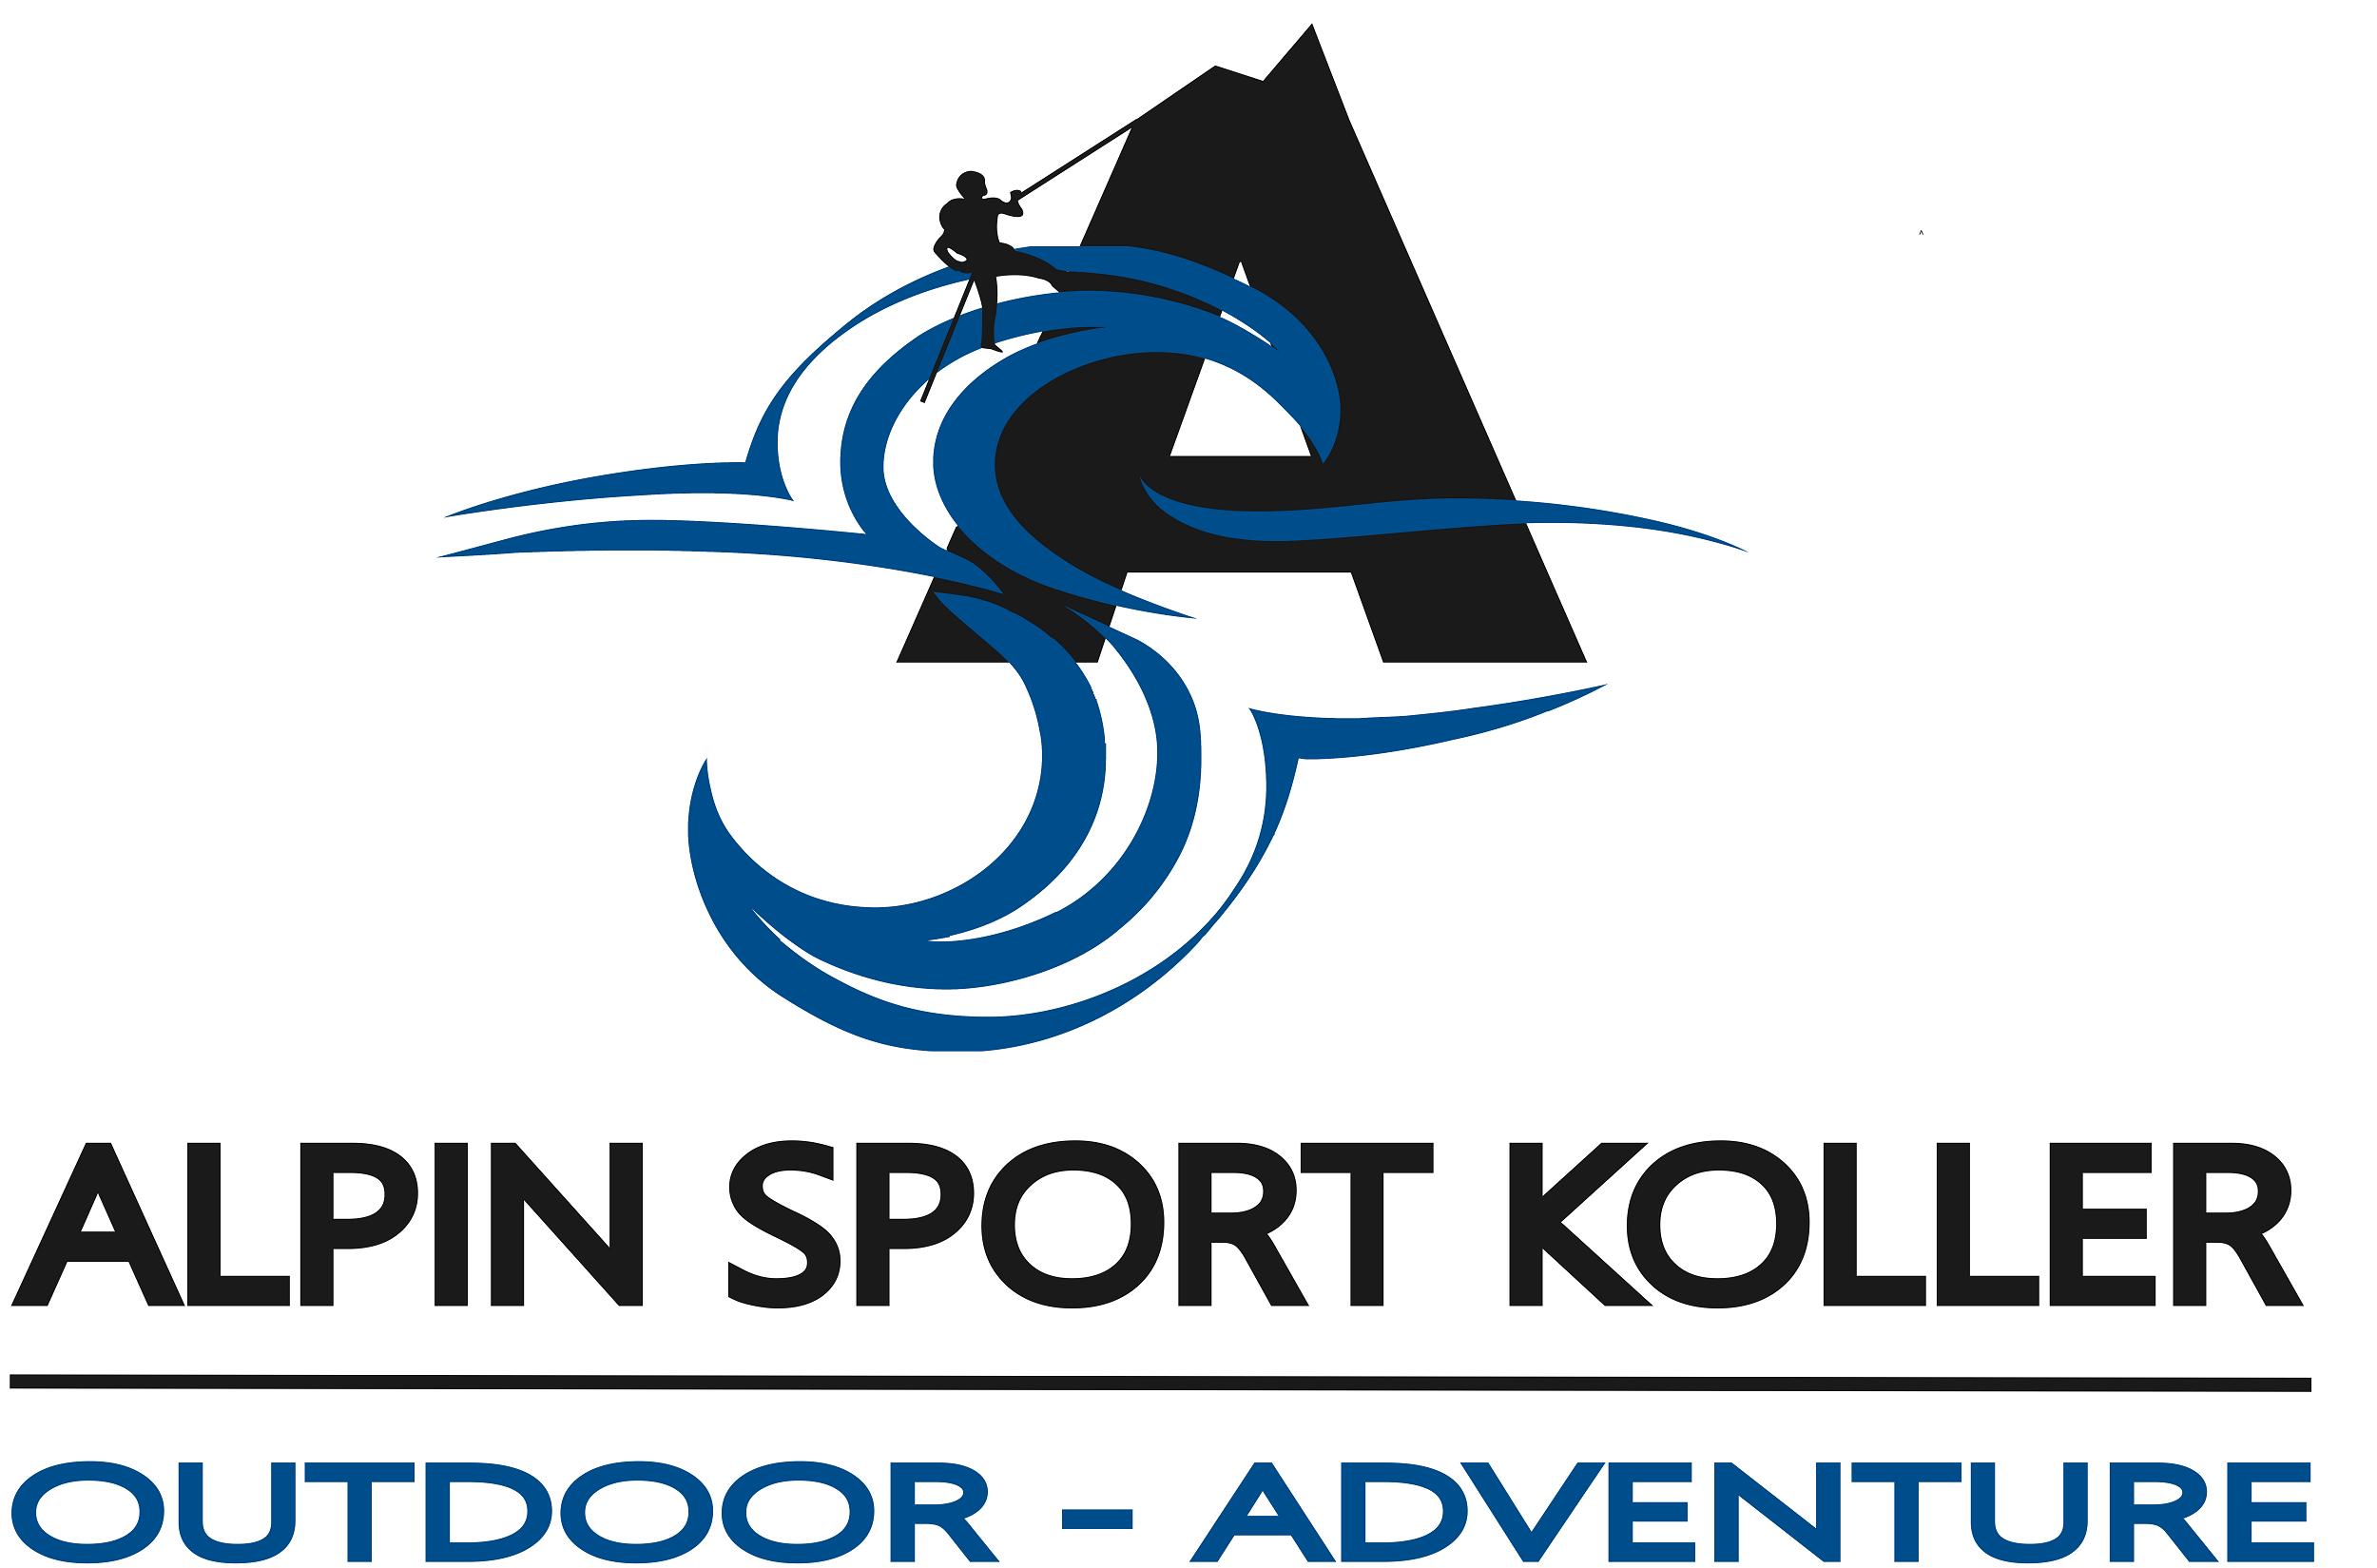 Alpinsport Koller Outdoor-Adventure